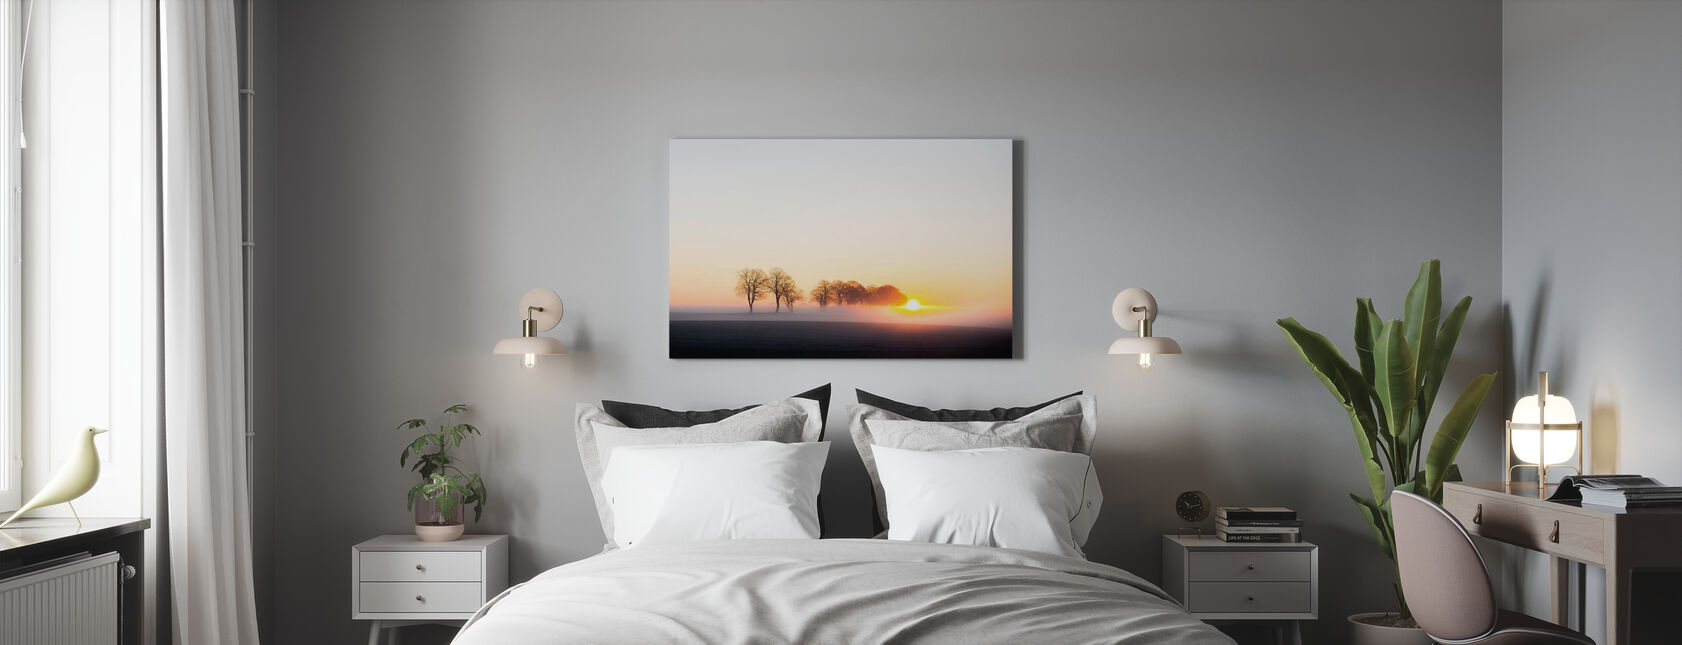 Vakna upp i Sverige - Canvastavla - Sovrum